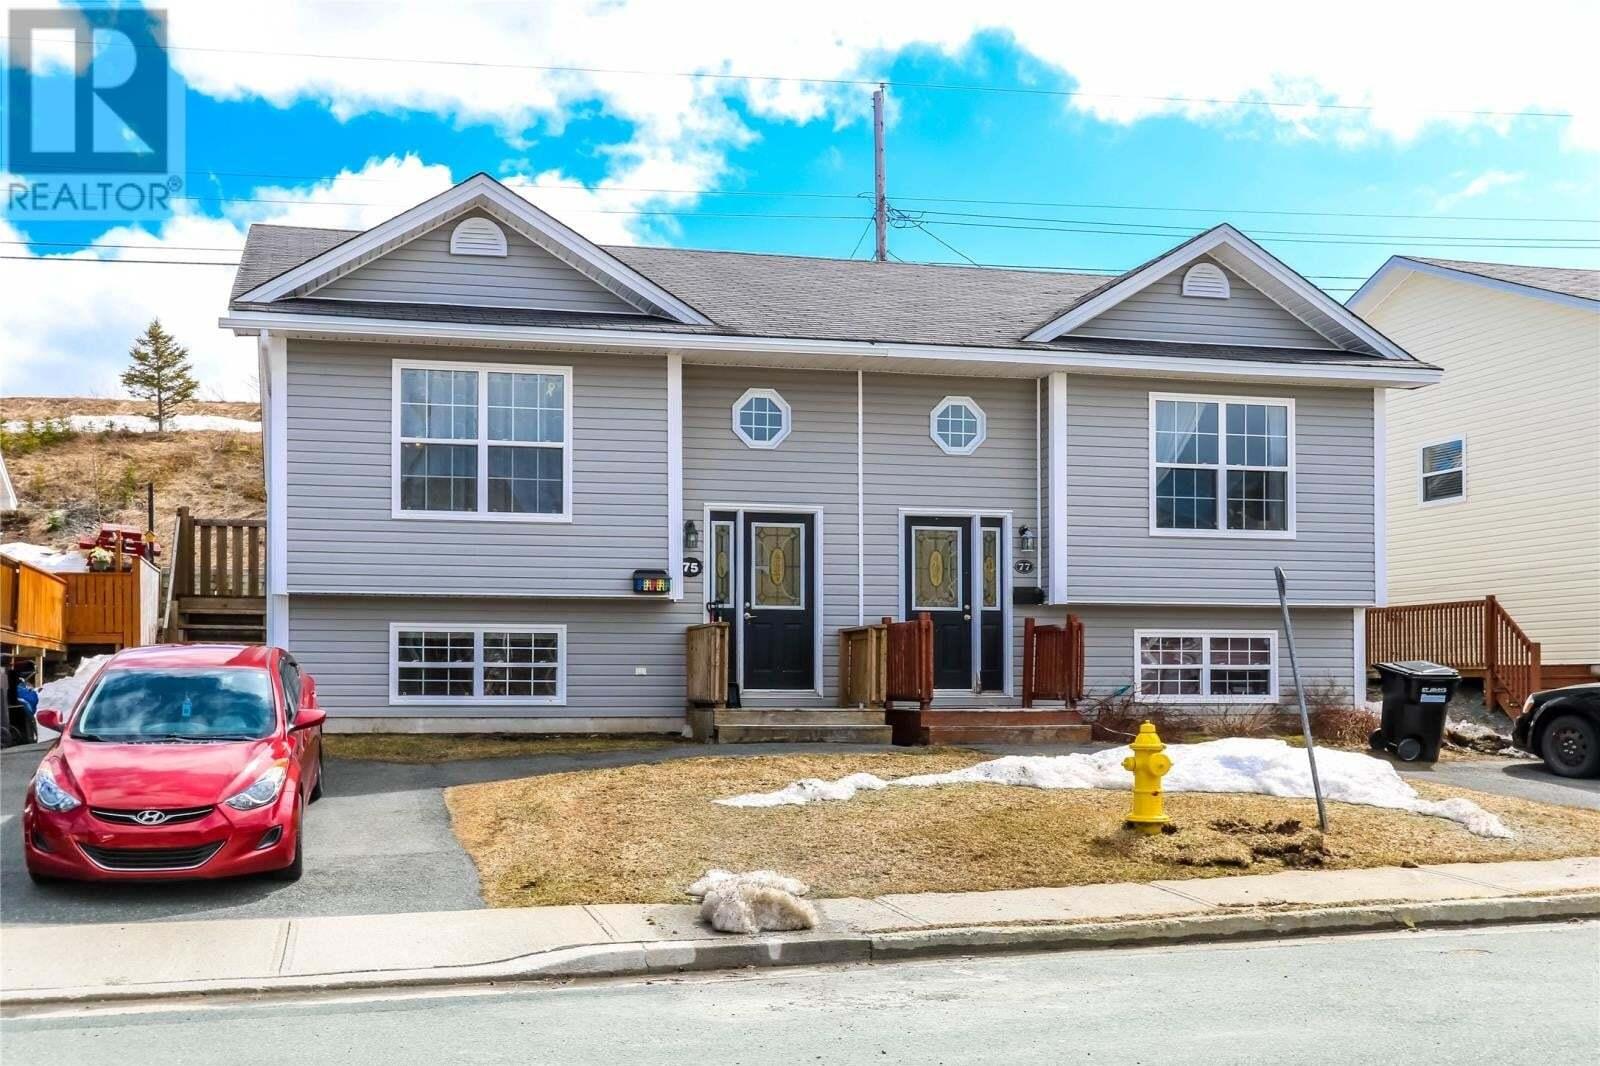 House for sale at 75 Edison Pl St. John's Newfoundland - MLS: 1217369